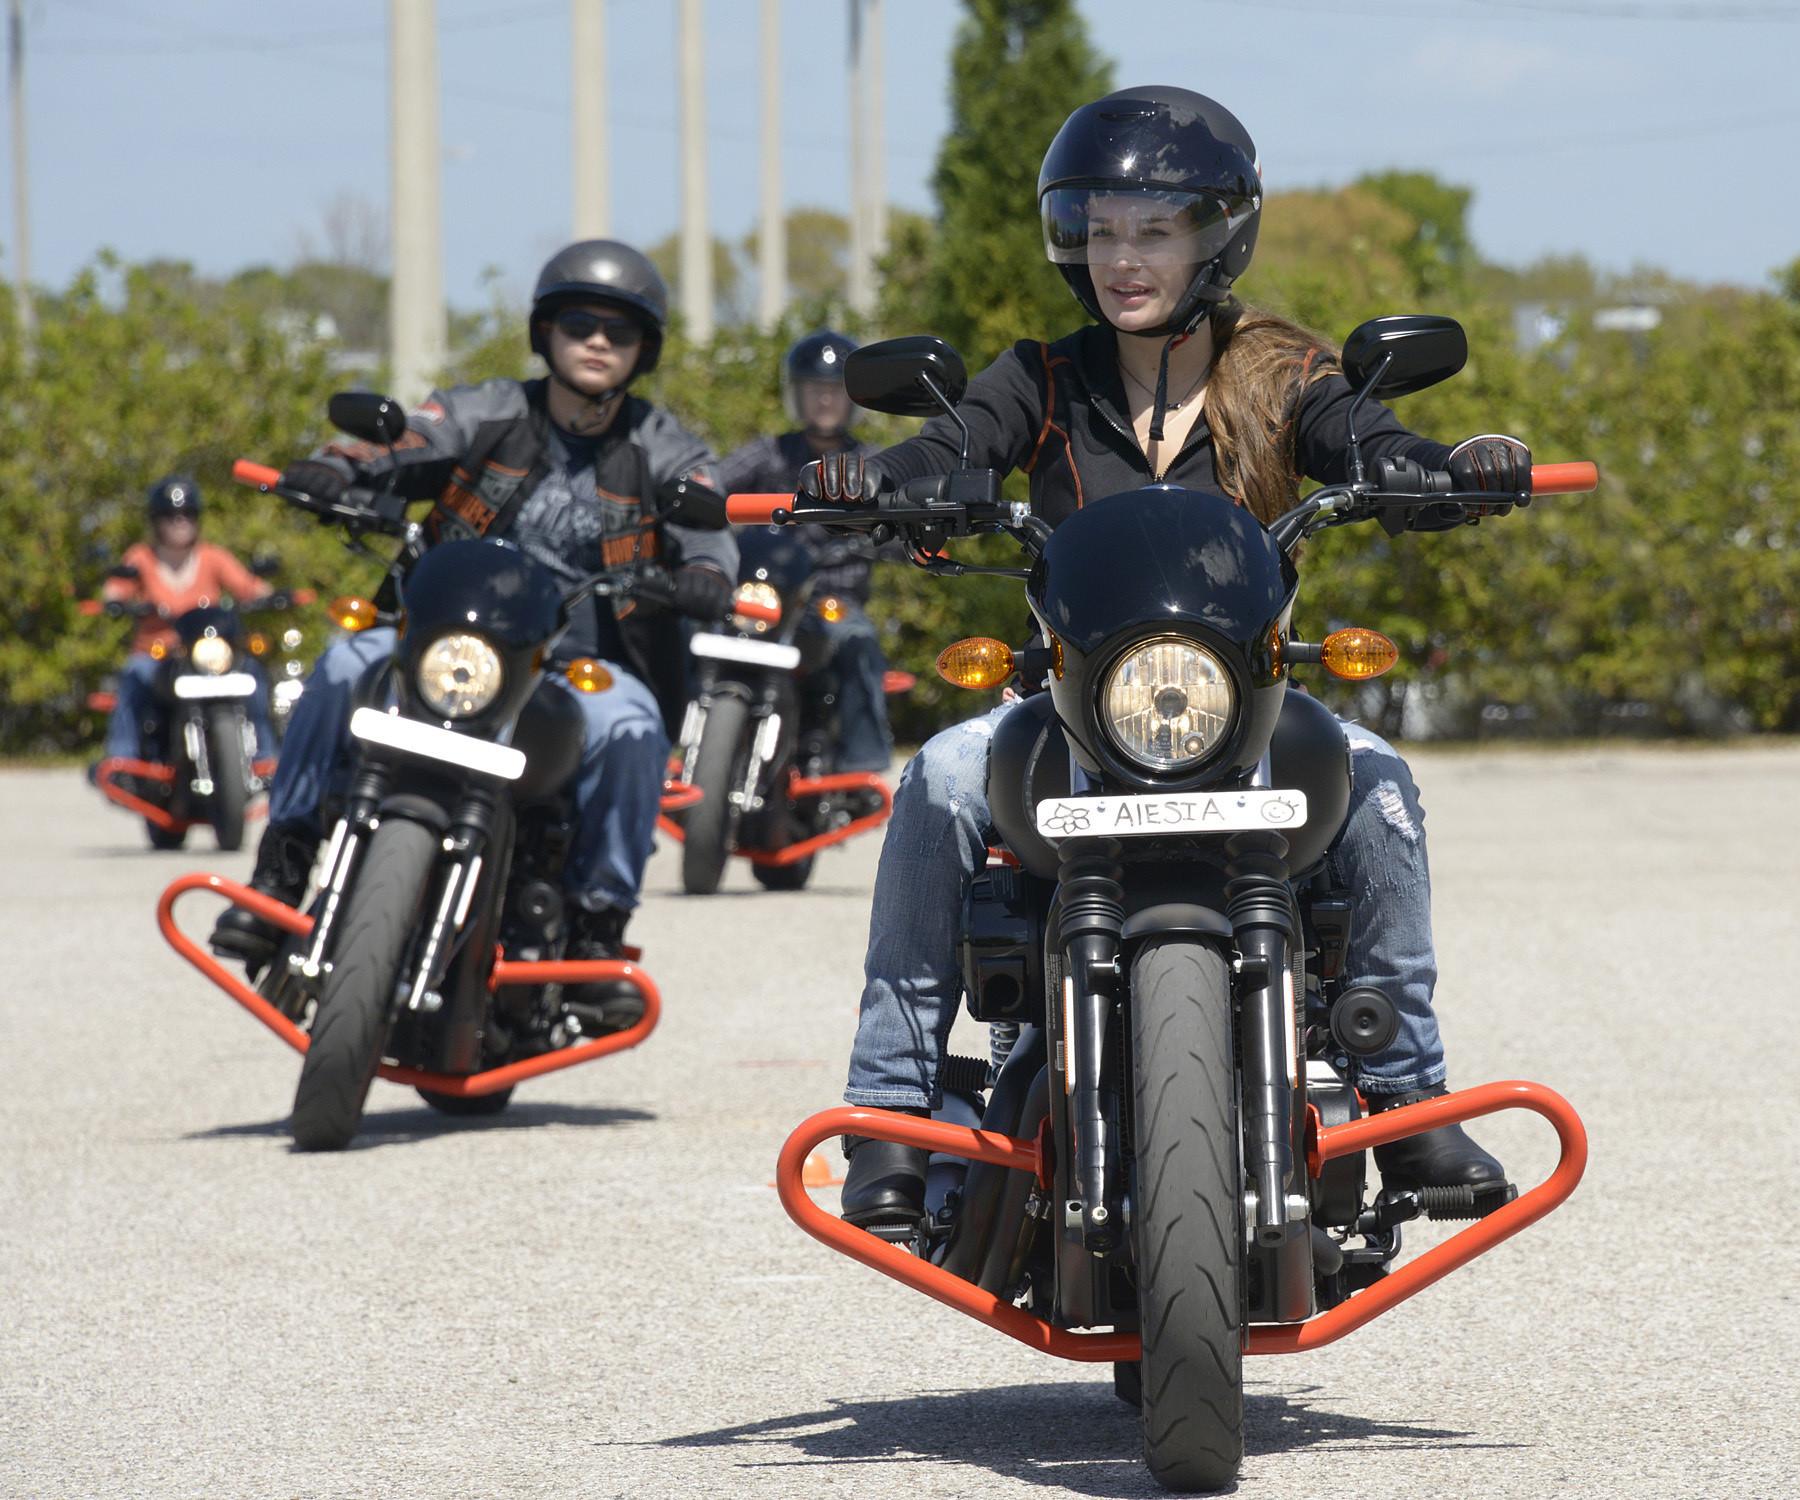 Harley Riders: Harley Street 500s Head To Dealers' Rider Training